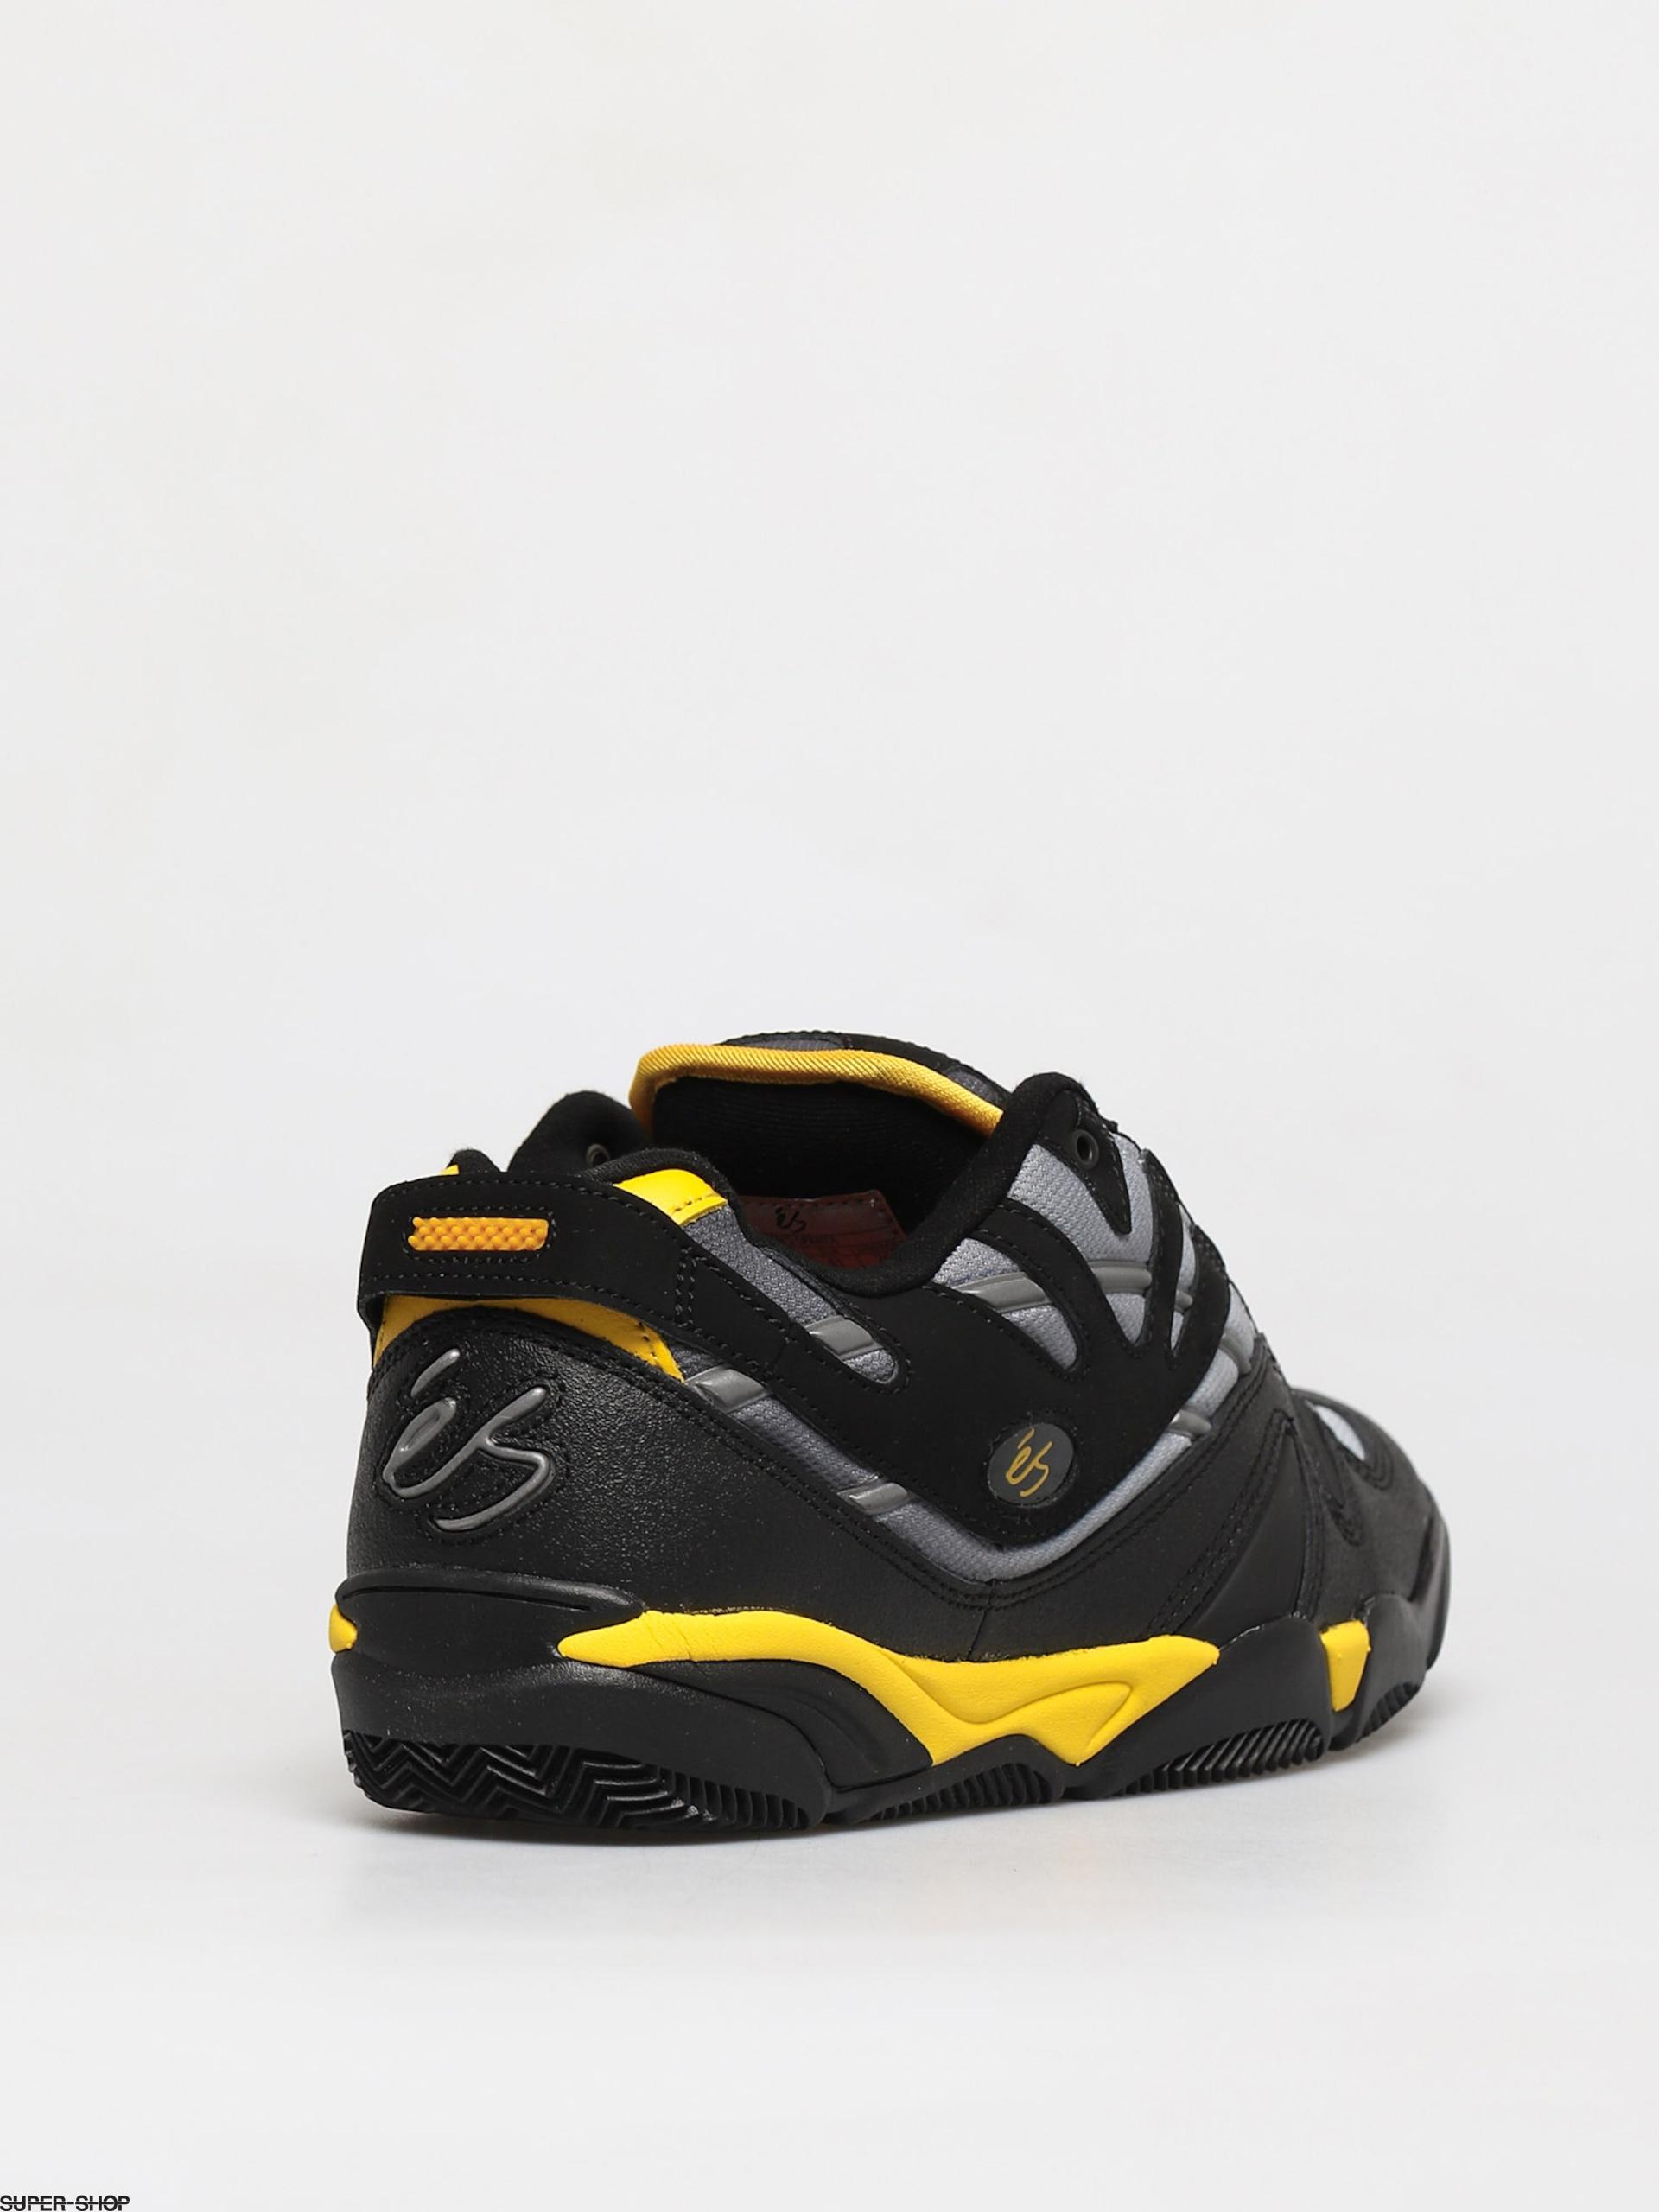 Black eS Sparta Shoes Yellow